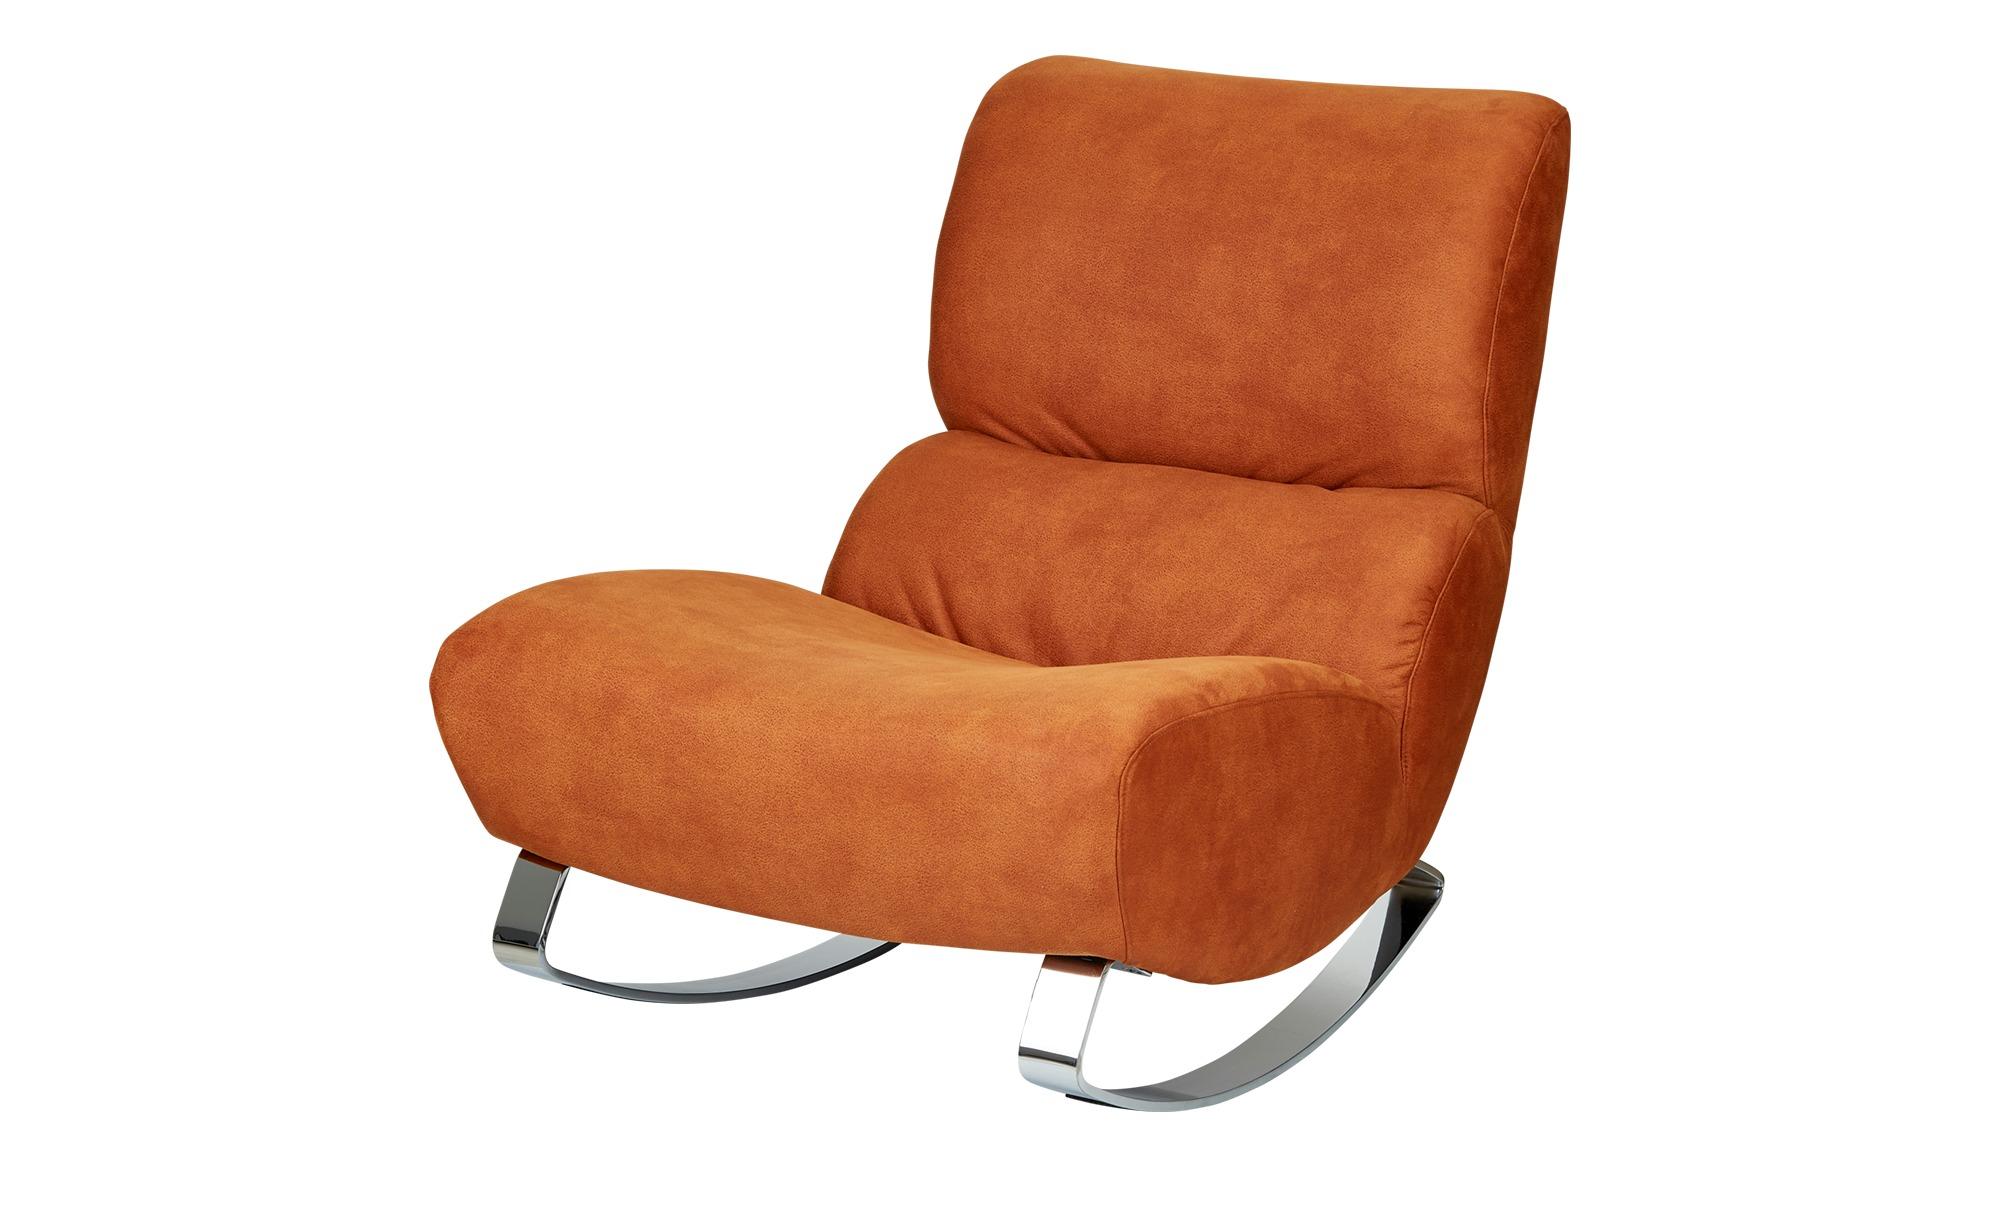 Design-Sessel orange - Stoff Citole ¦ orange ¦ Maße (cm): B: 76 H: 90 T: 103 Polstermöbel > Sessel > Polstersessel - Höffner